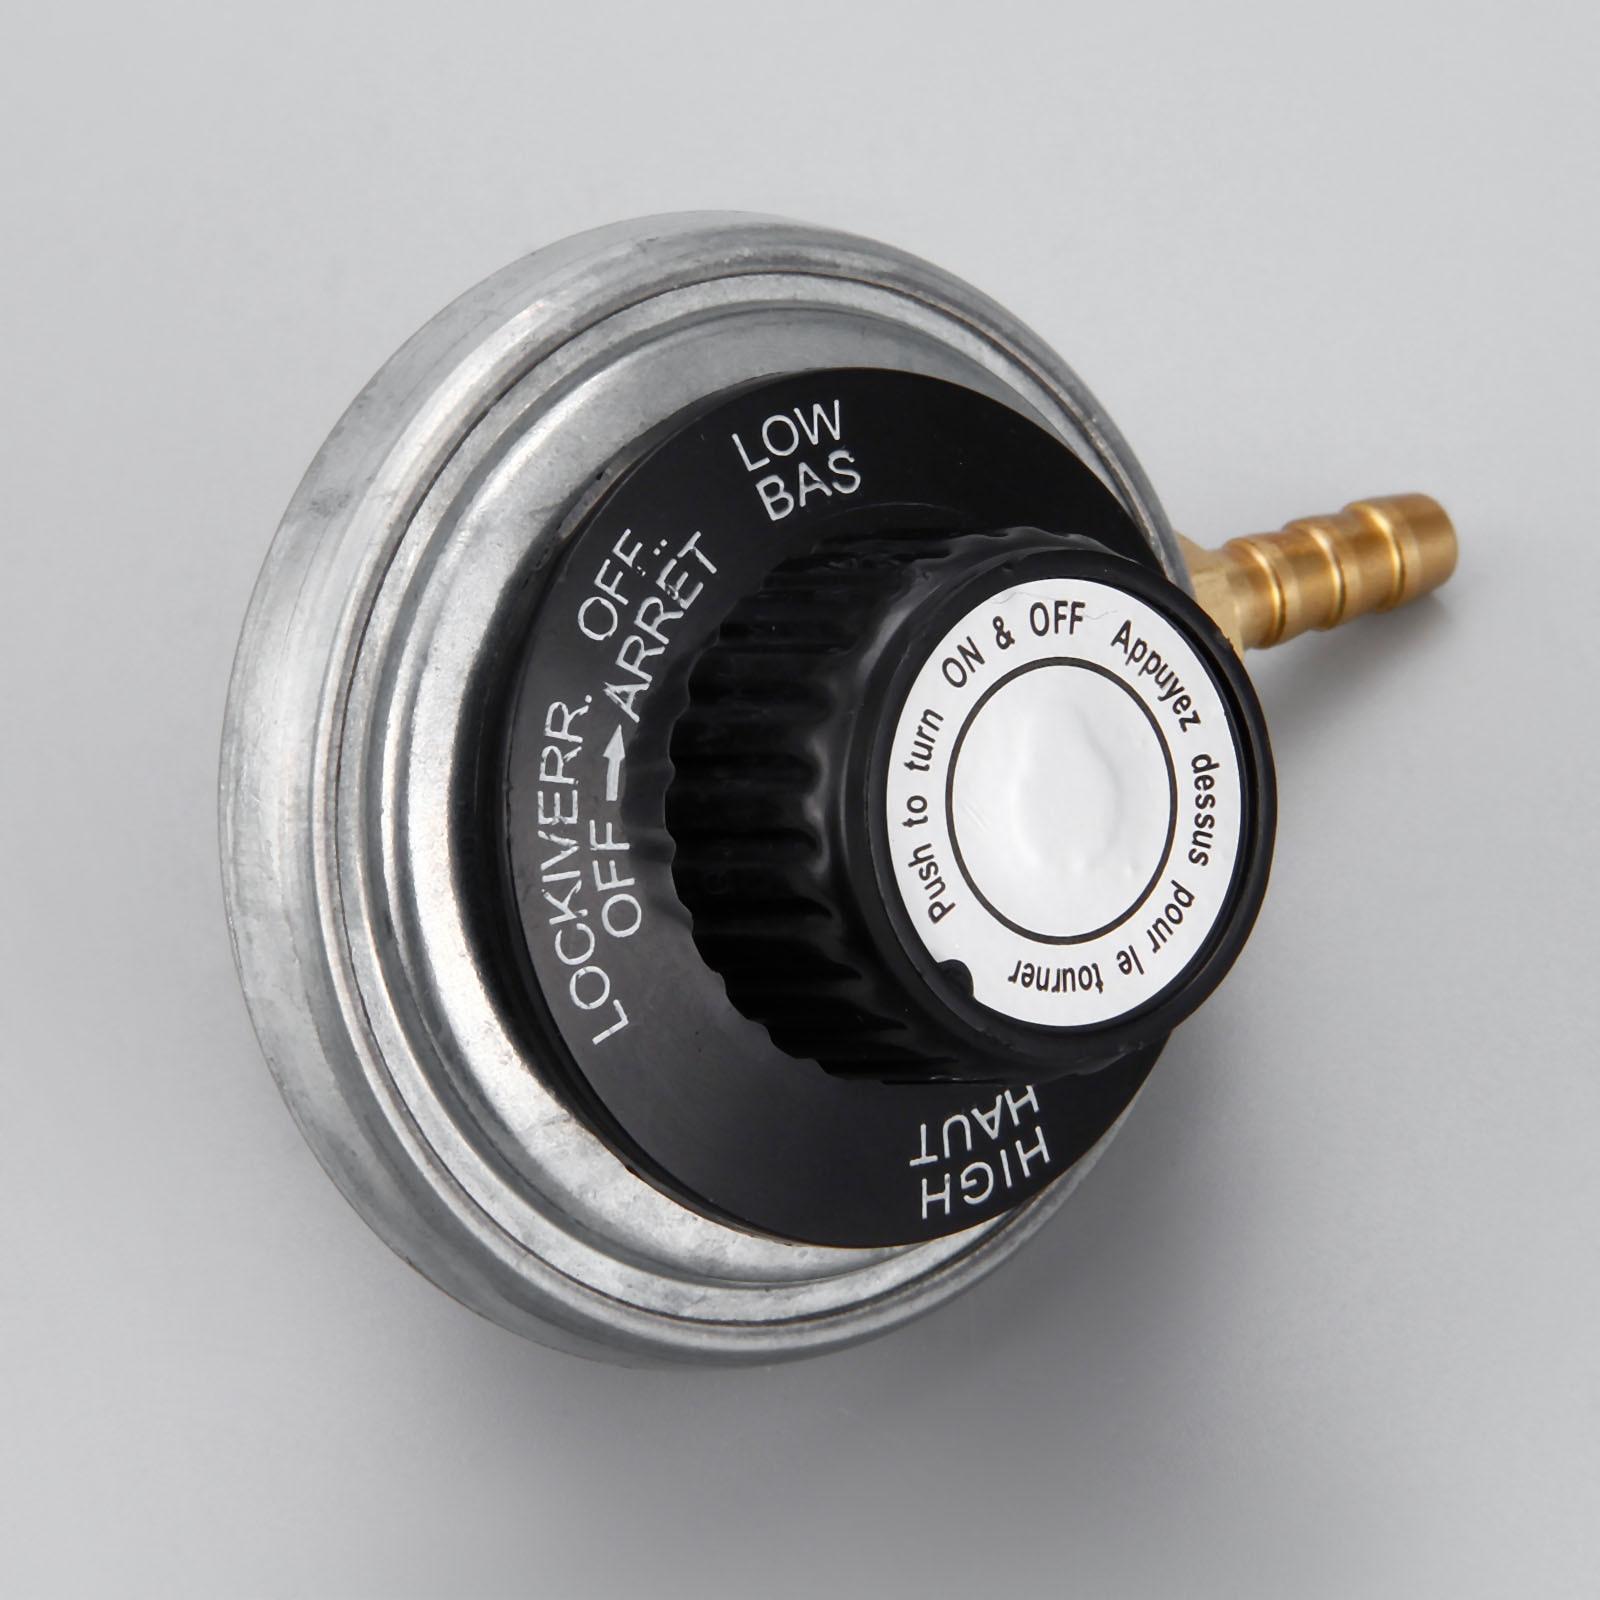 One Pound Propane Tank Low Pressure Gas Regulator Valve Adjustable Propane Tank 1/4inchbarb Hose Connection Kit 47600 BTU/HR